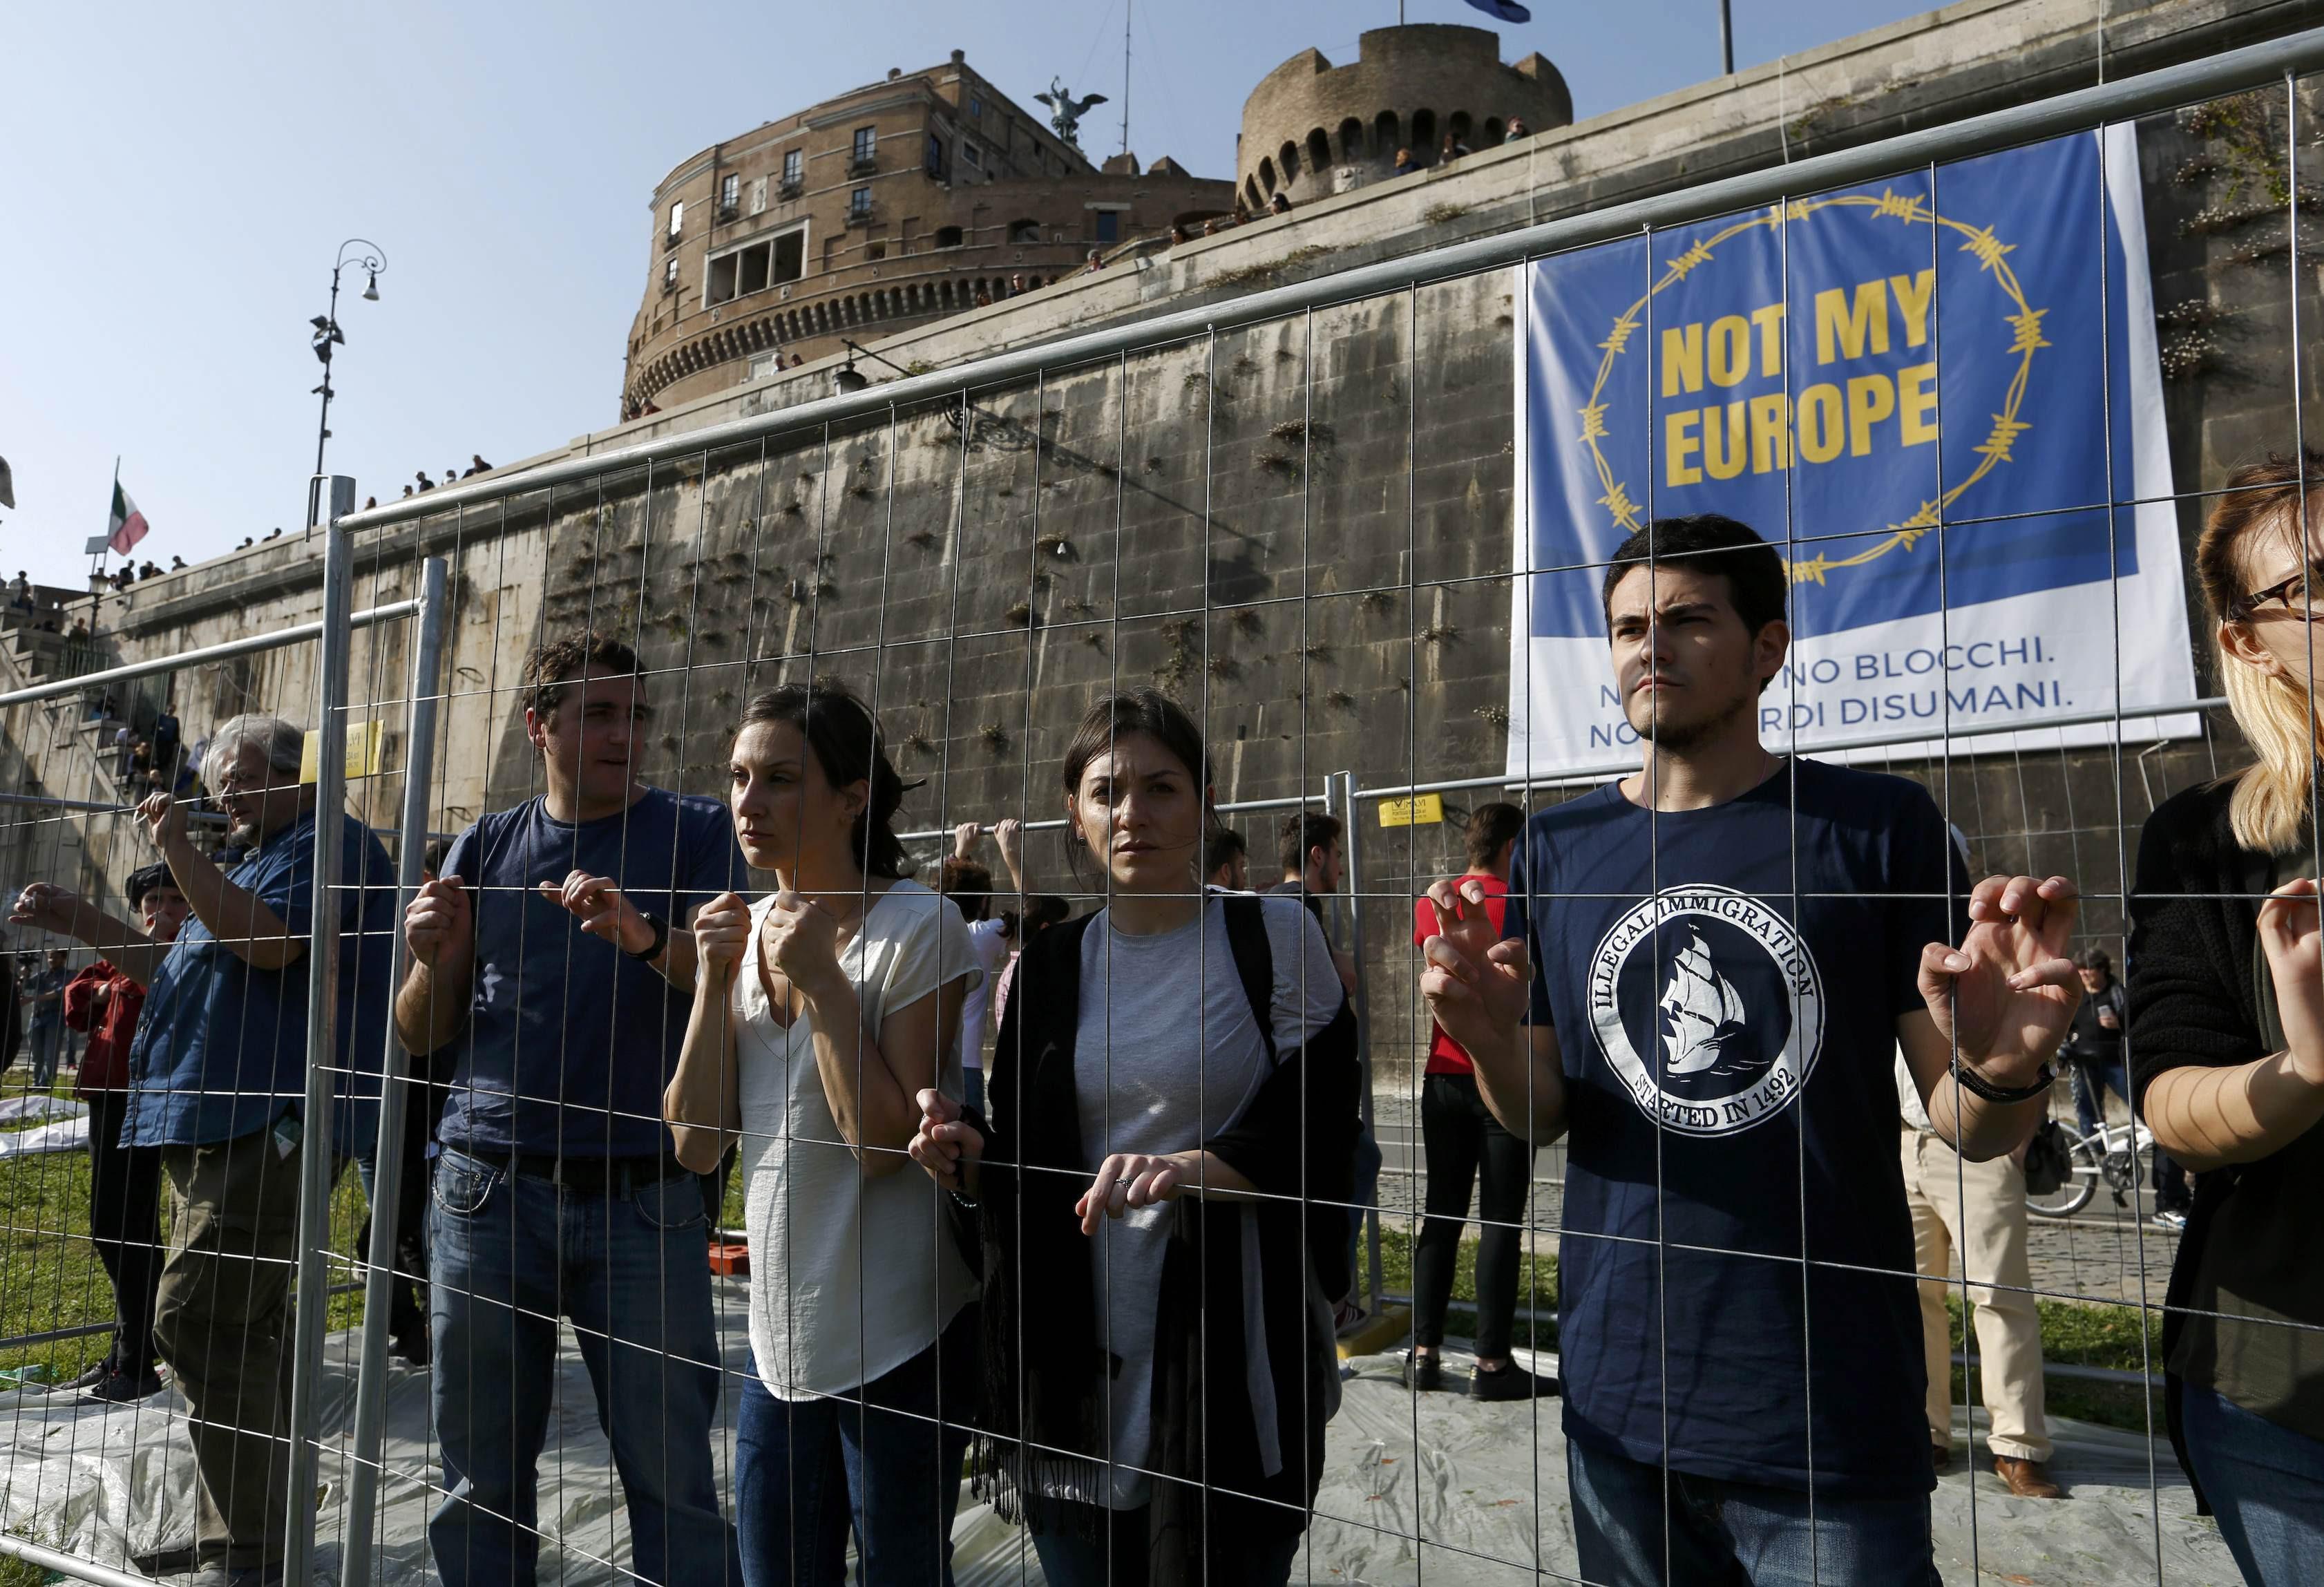 Performans protiv Europske unije u Rimu